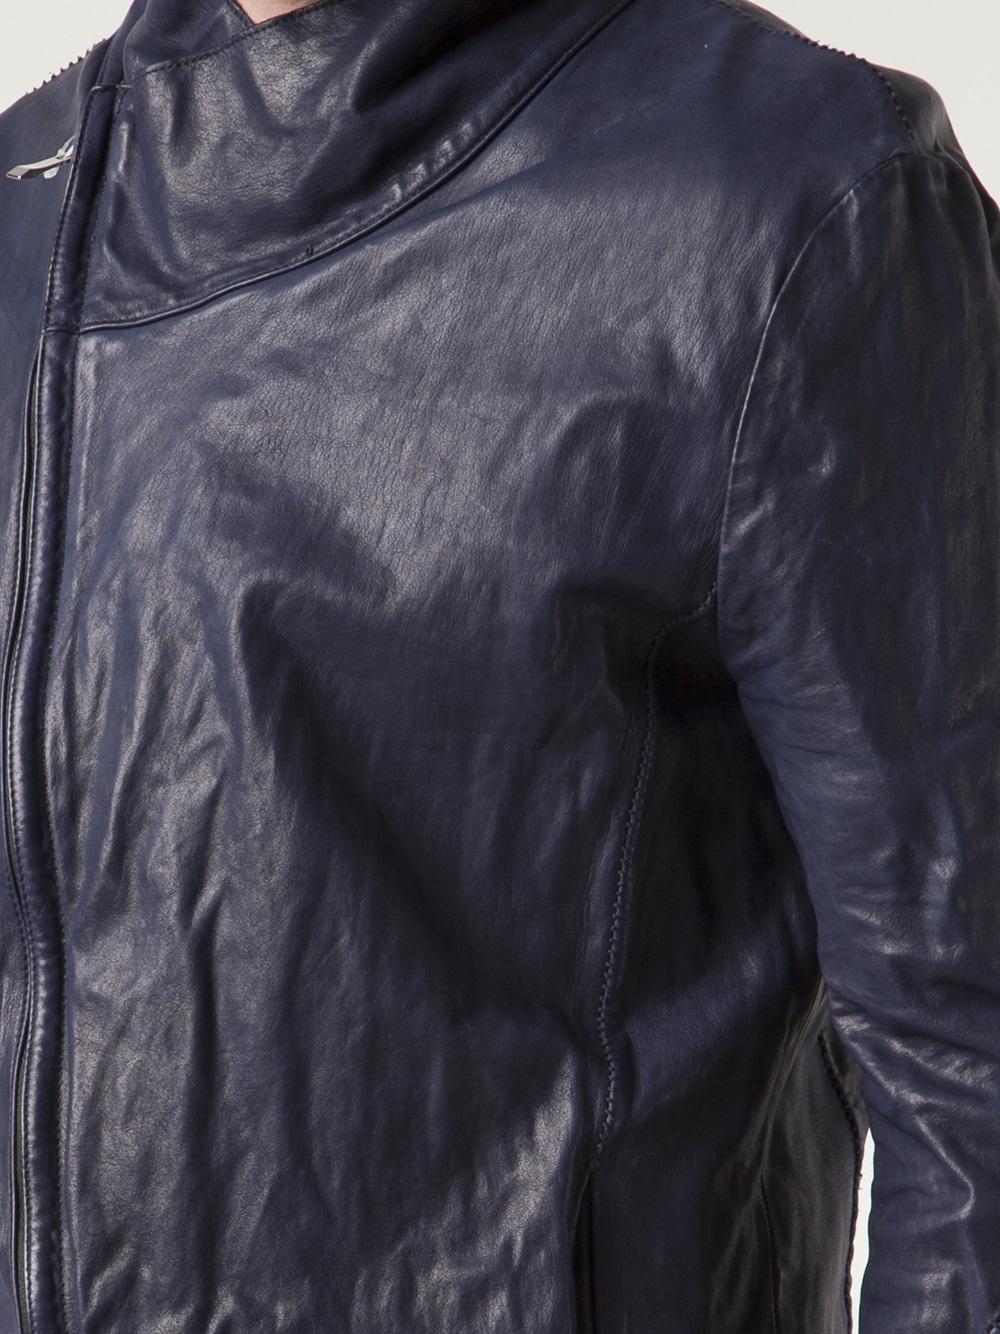 Incarnation Leather Zip Jacket In Blue For Men Lyst